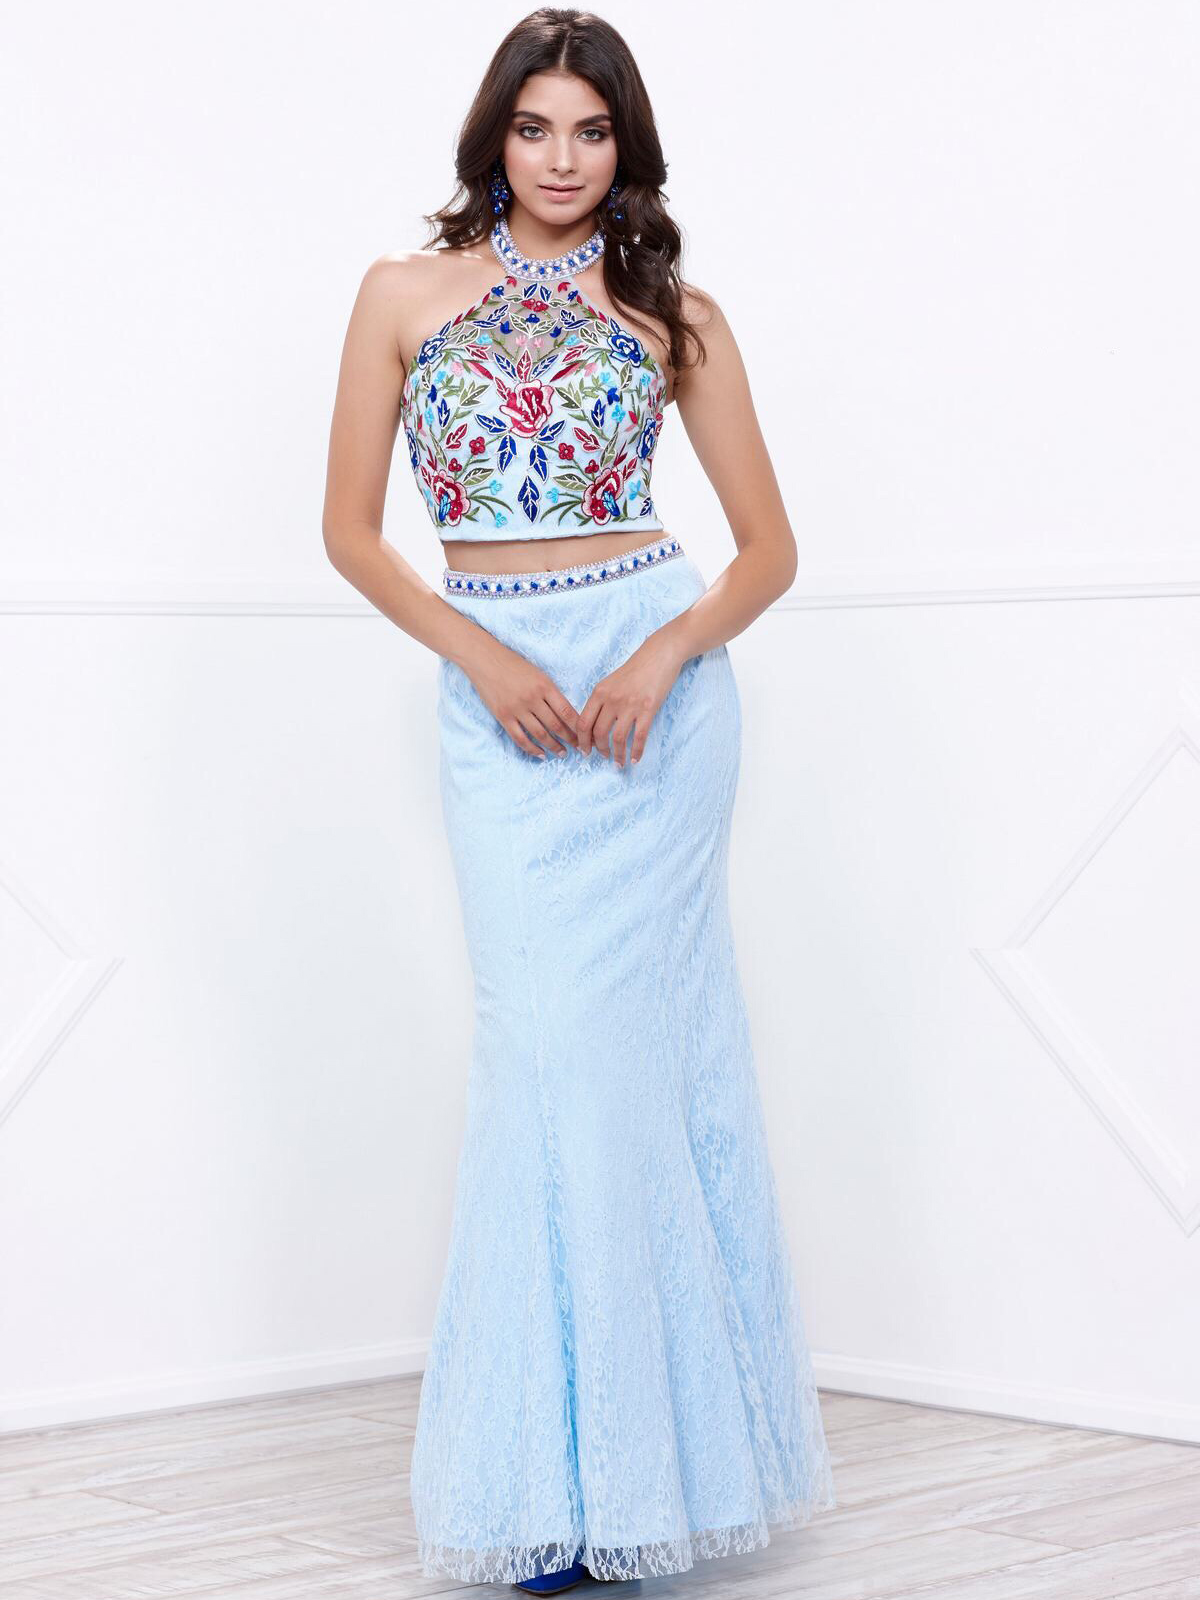 Two Piece Halter Top Lace Long Prom Dress Sung Boutique L A